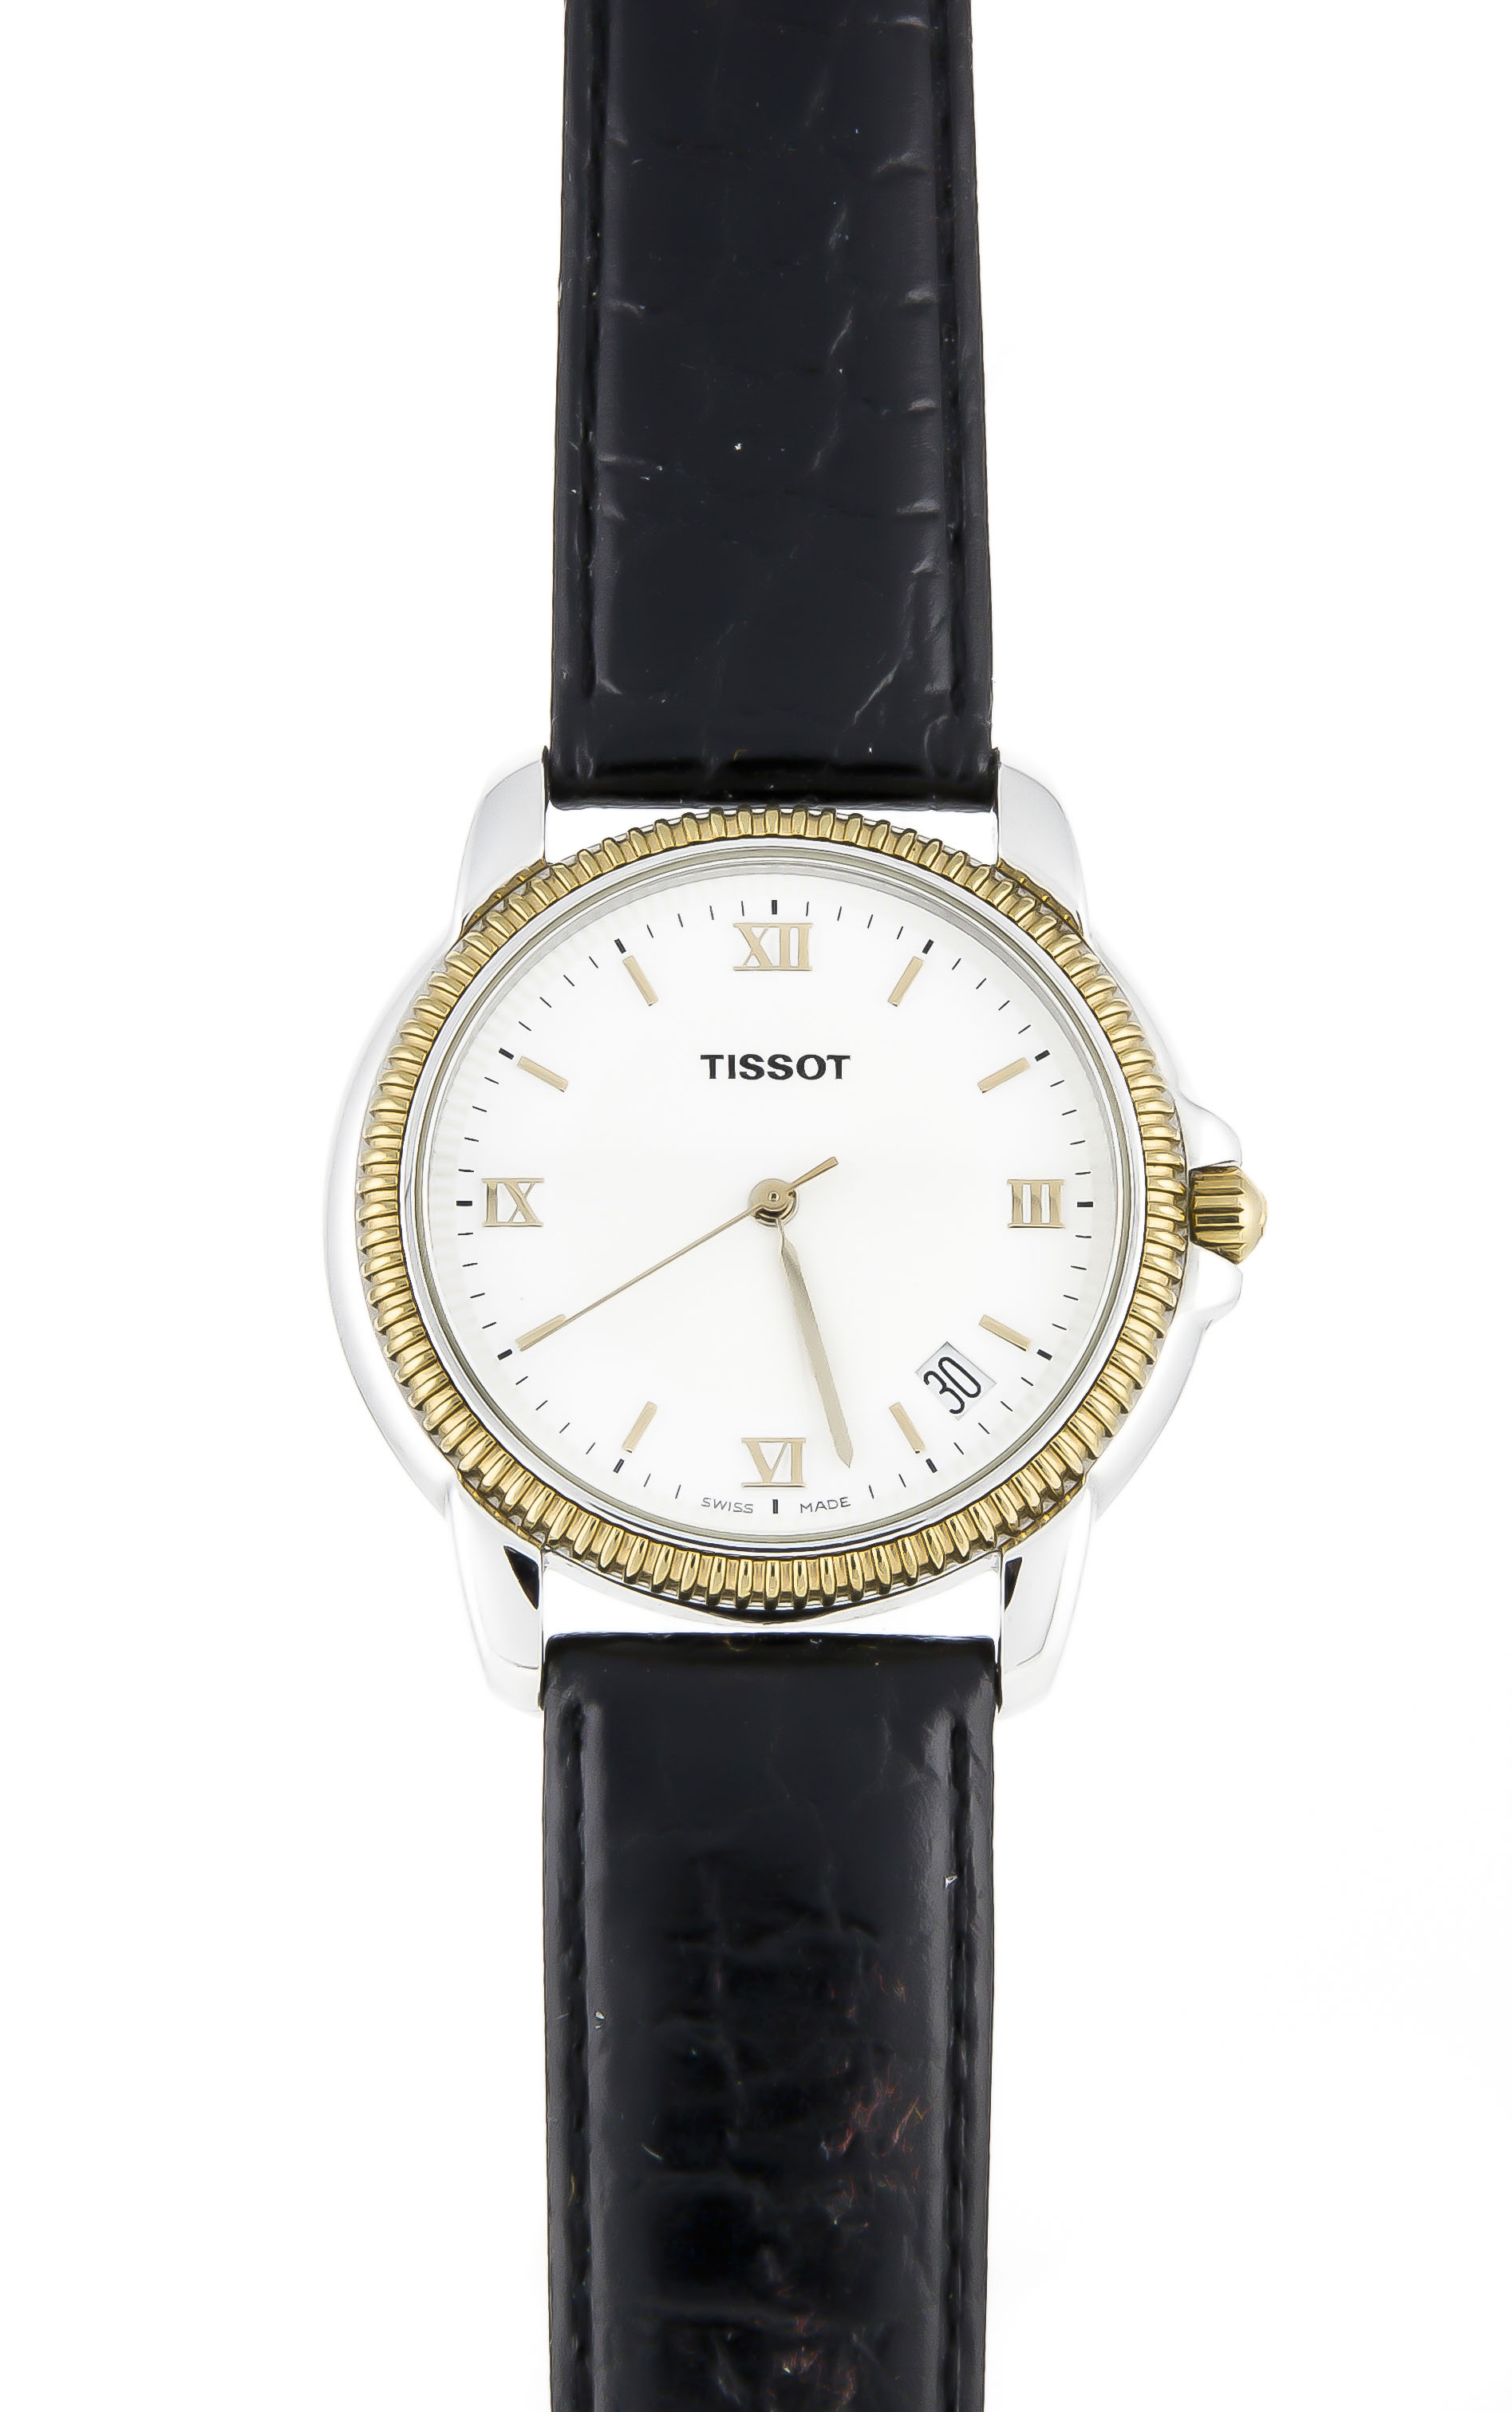 Herrenuhr Tissot Seastar, Automatik bicolor, Mod auctions